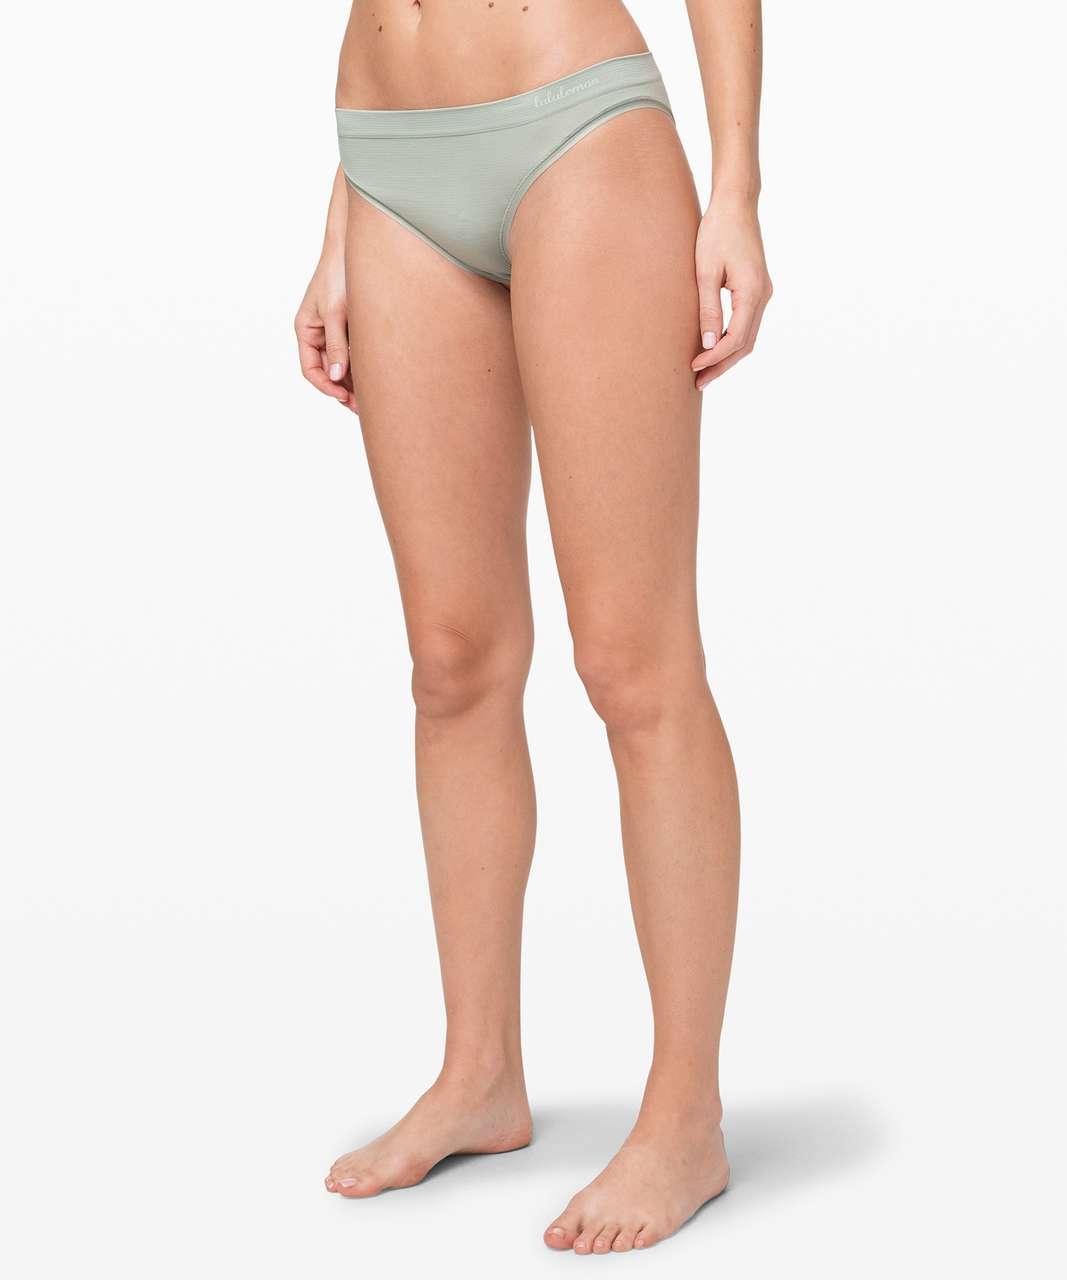 Lululemon Truly Tranquil Cheeky Bikini - Jade Grey